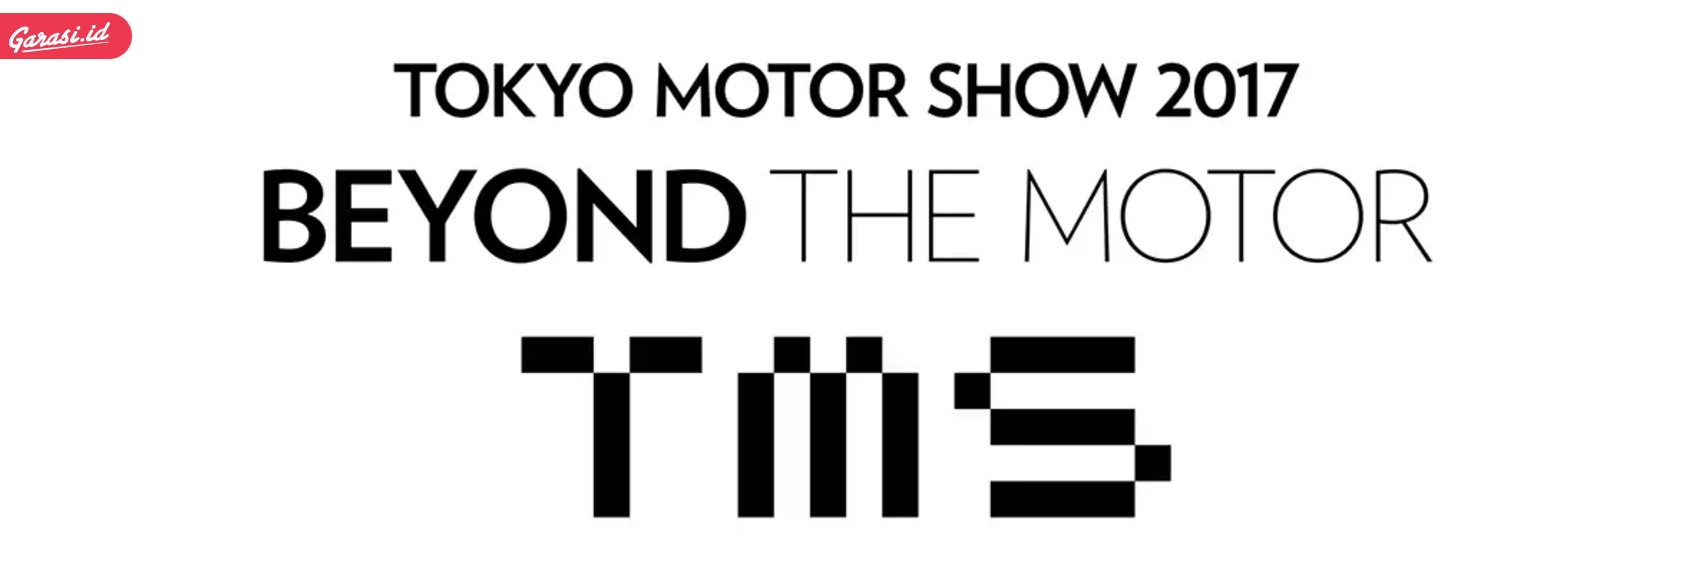 Beyond The Motor